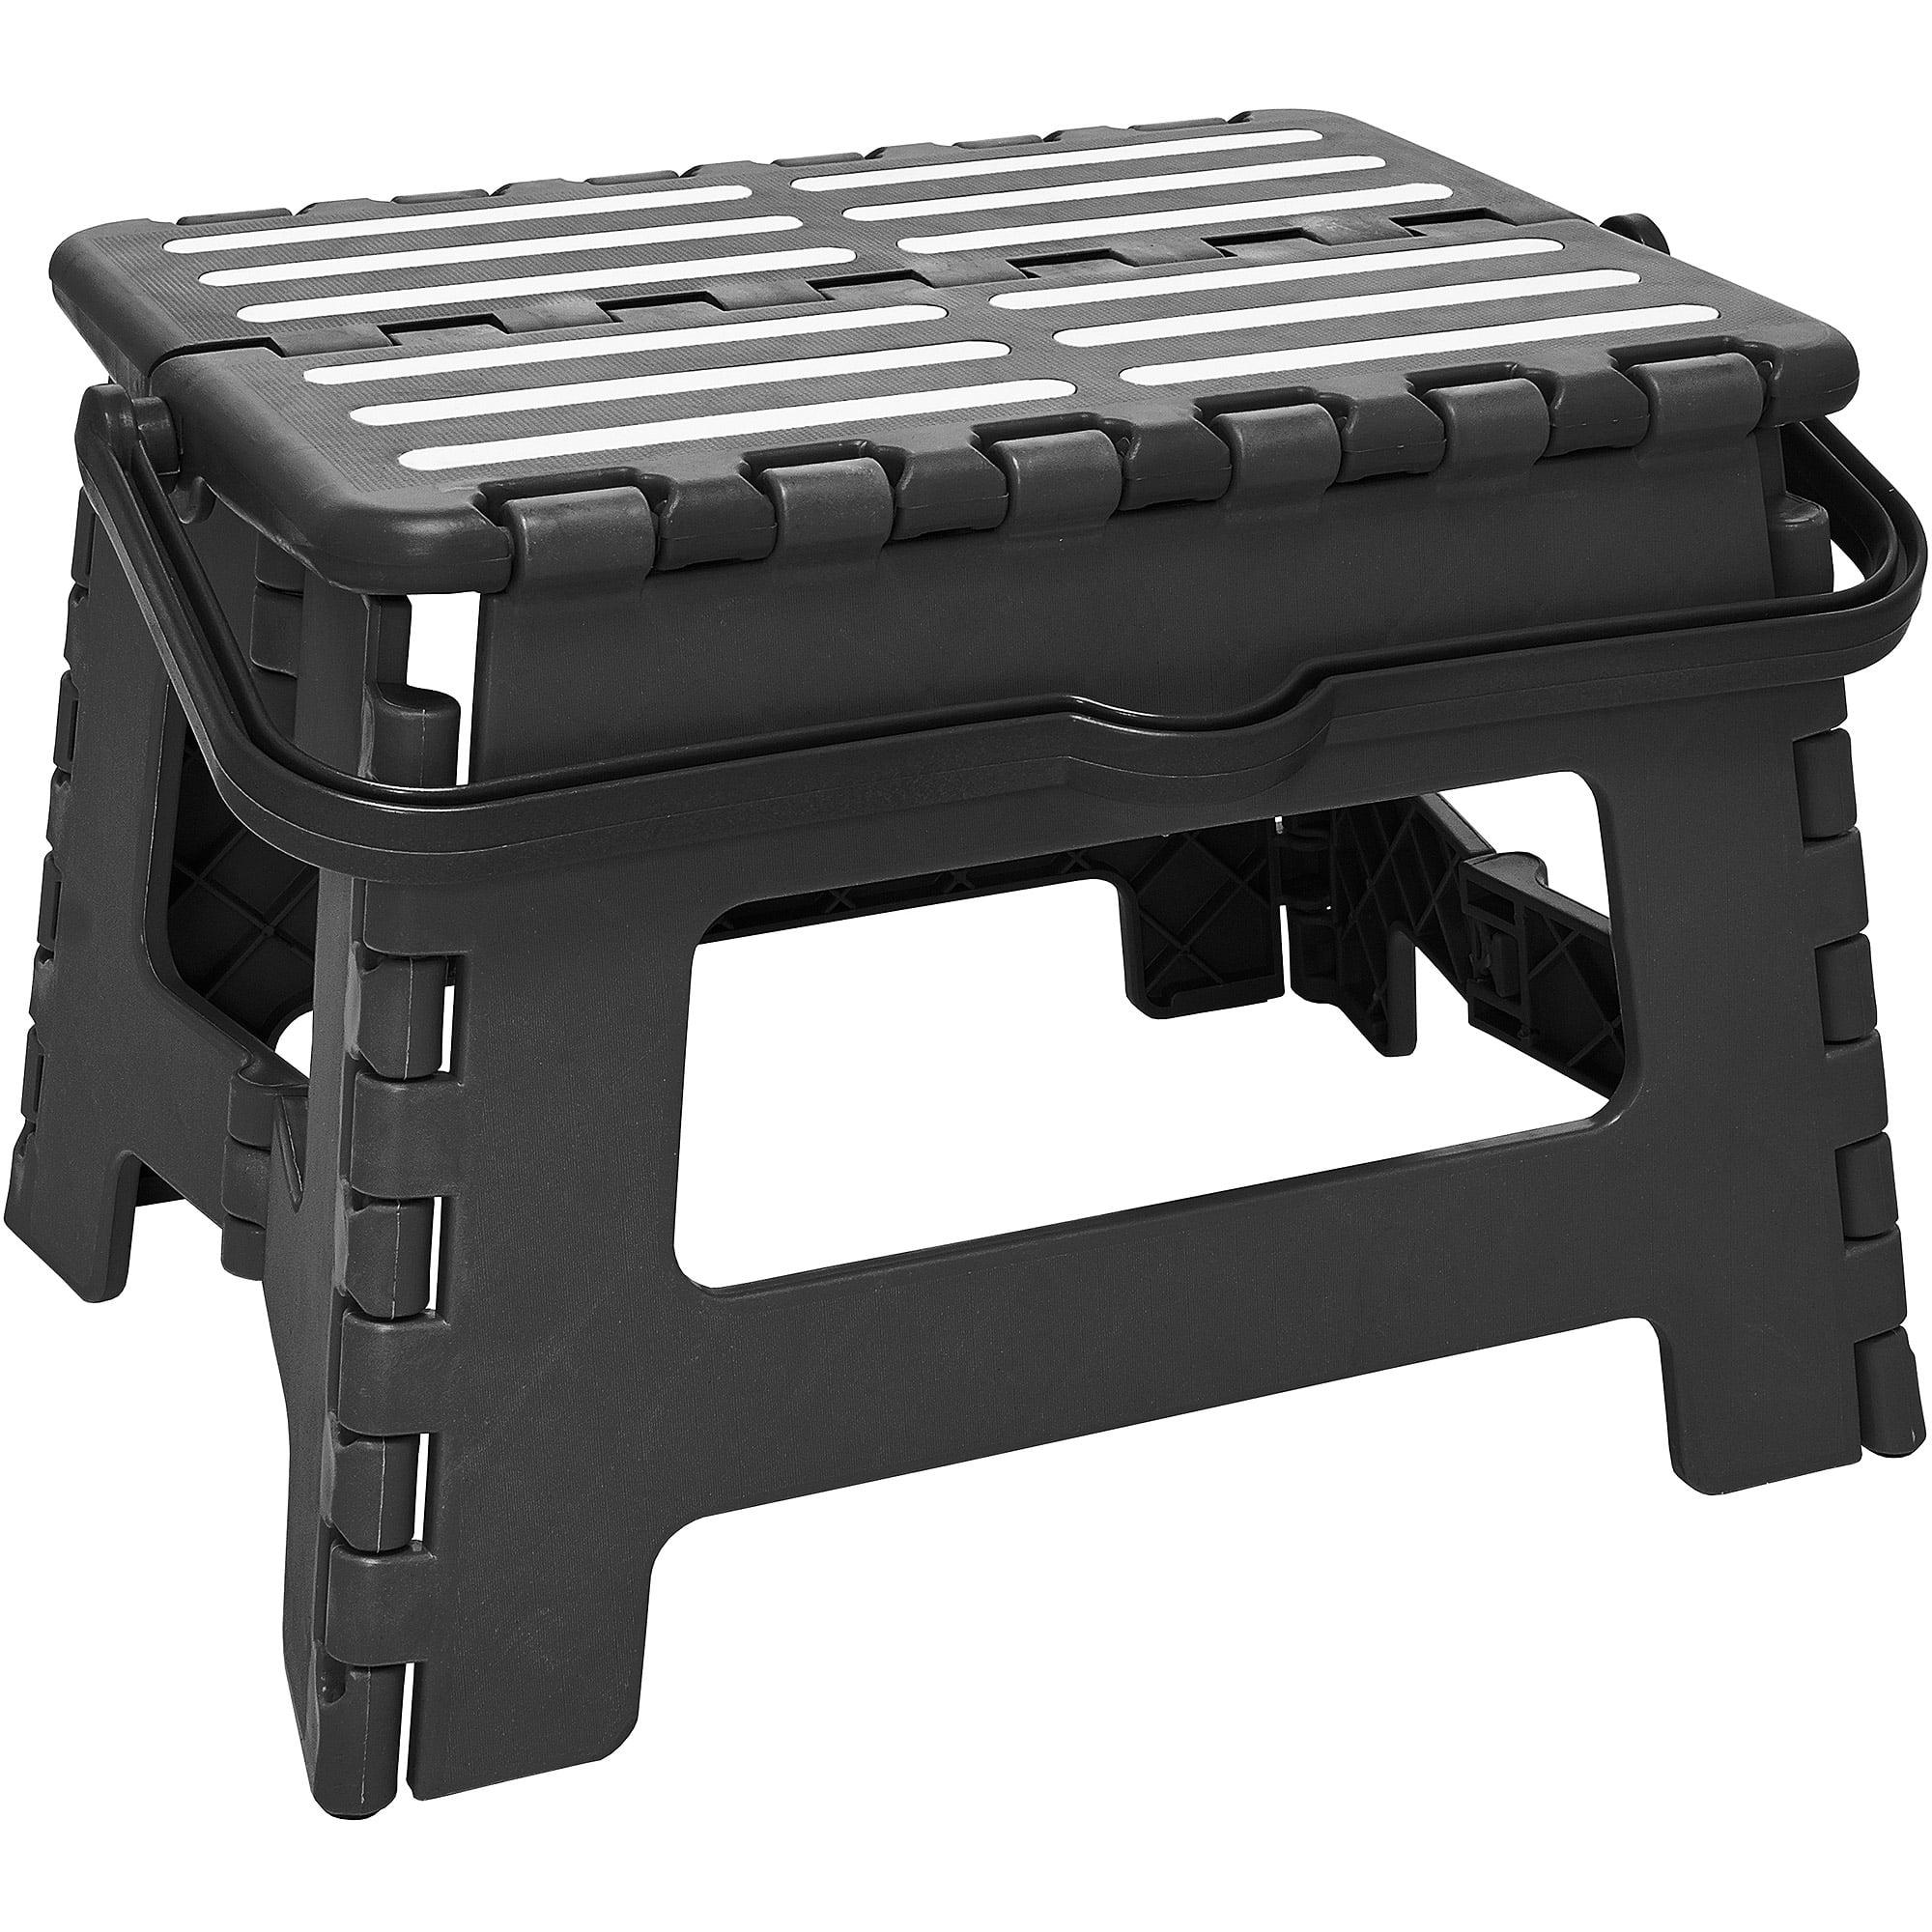 Simplify Striped Folding Step Stool With Handle Walmart Com